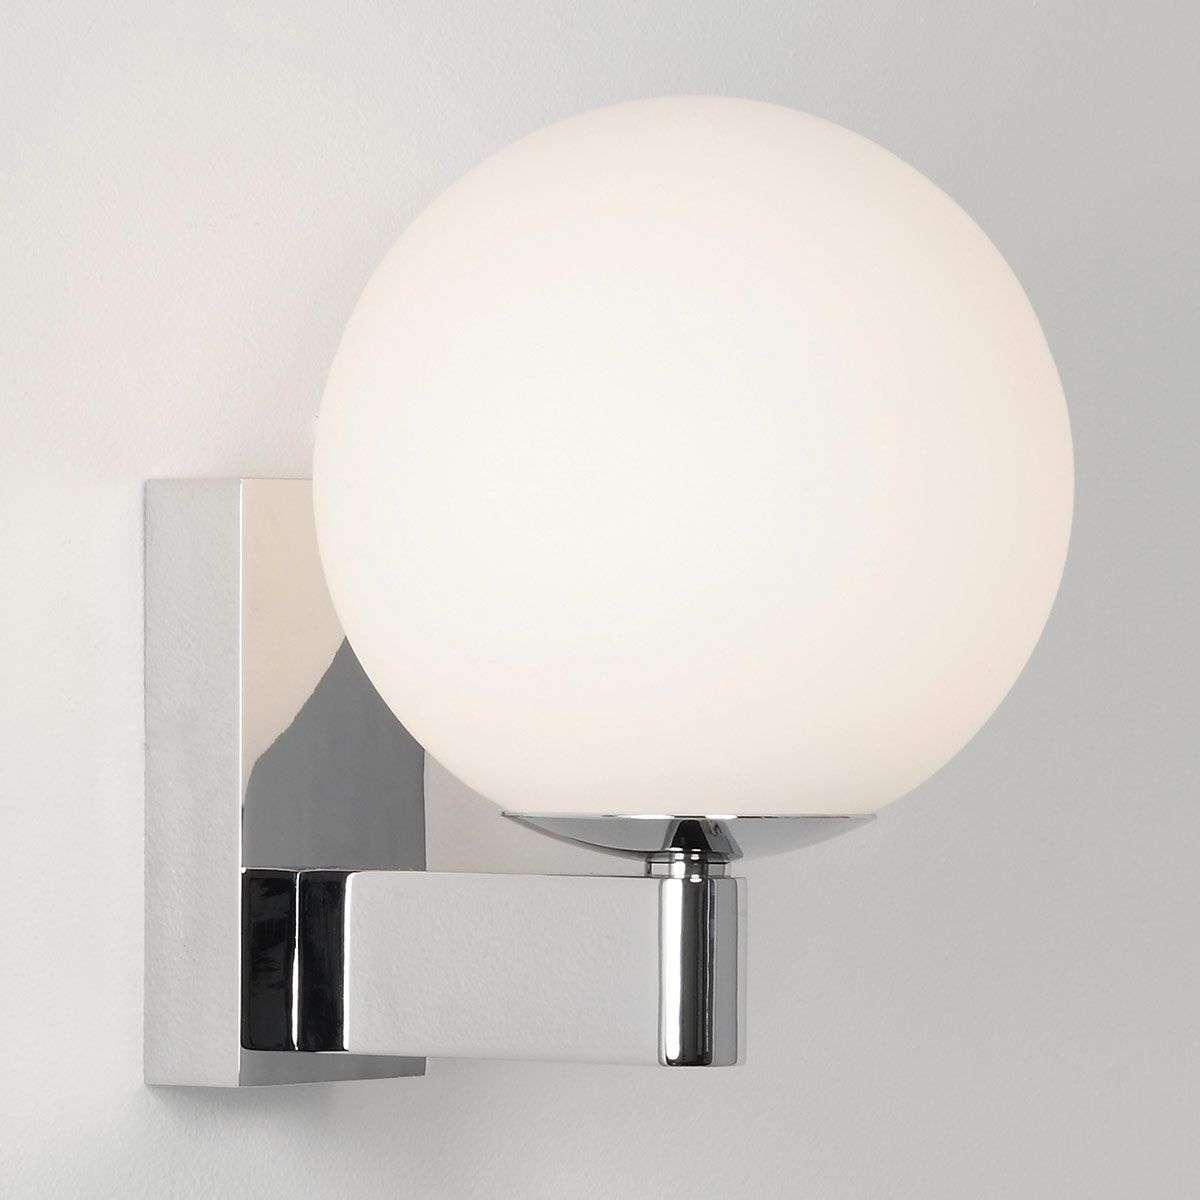 Sagara Bathroom Wall Light Elegant-1020002-32